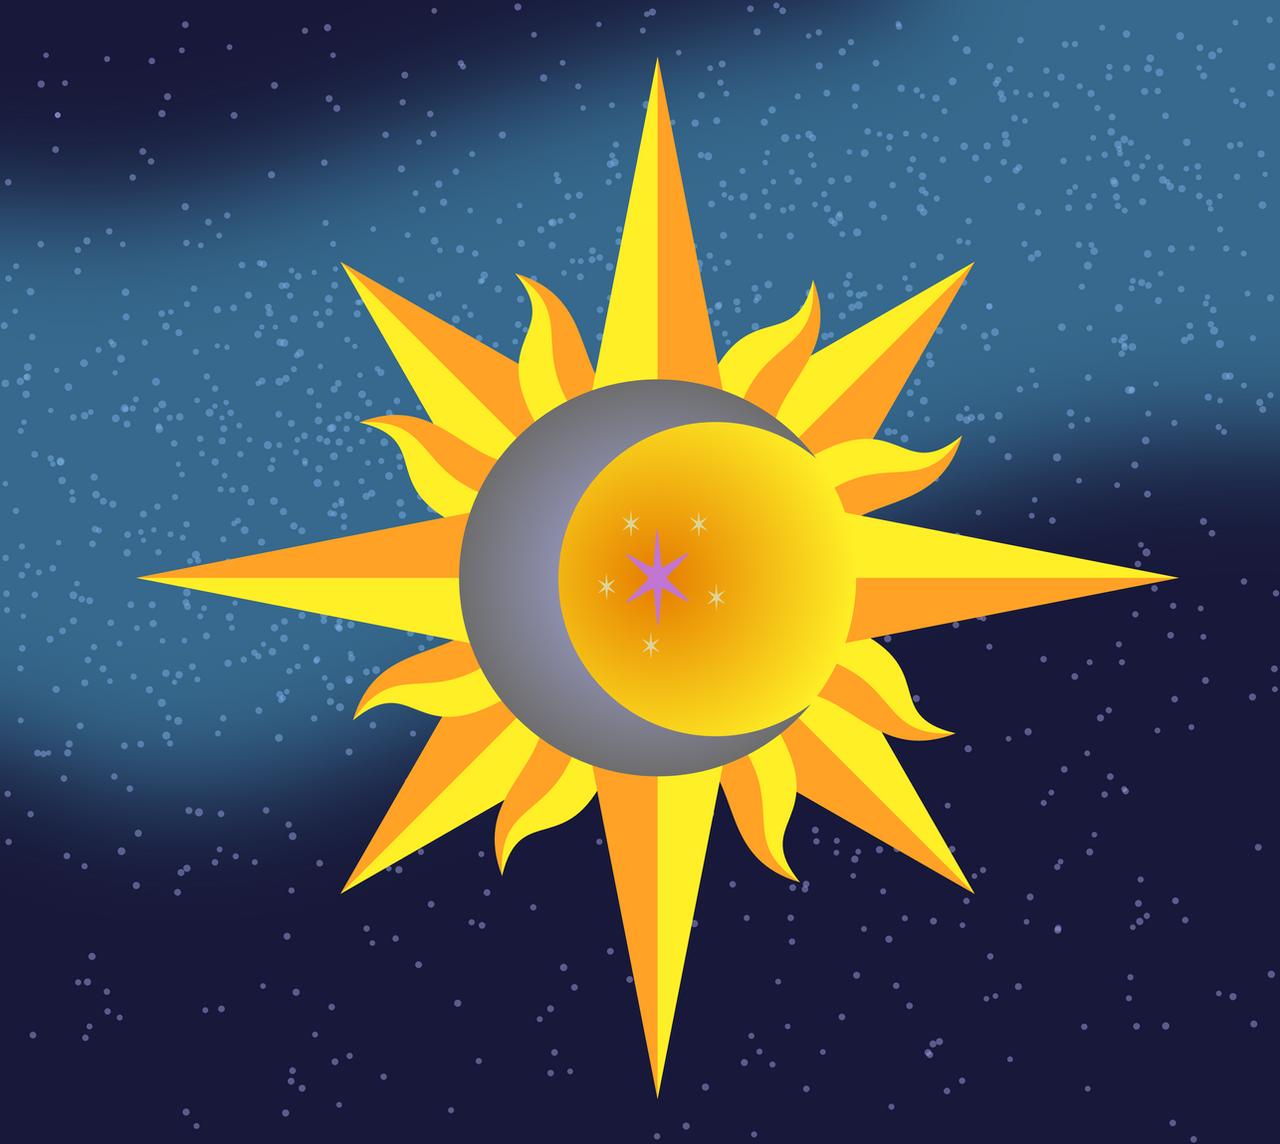 star background sun moon - photo #29